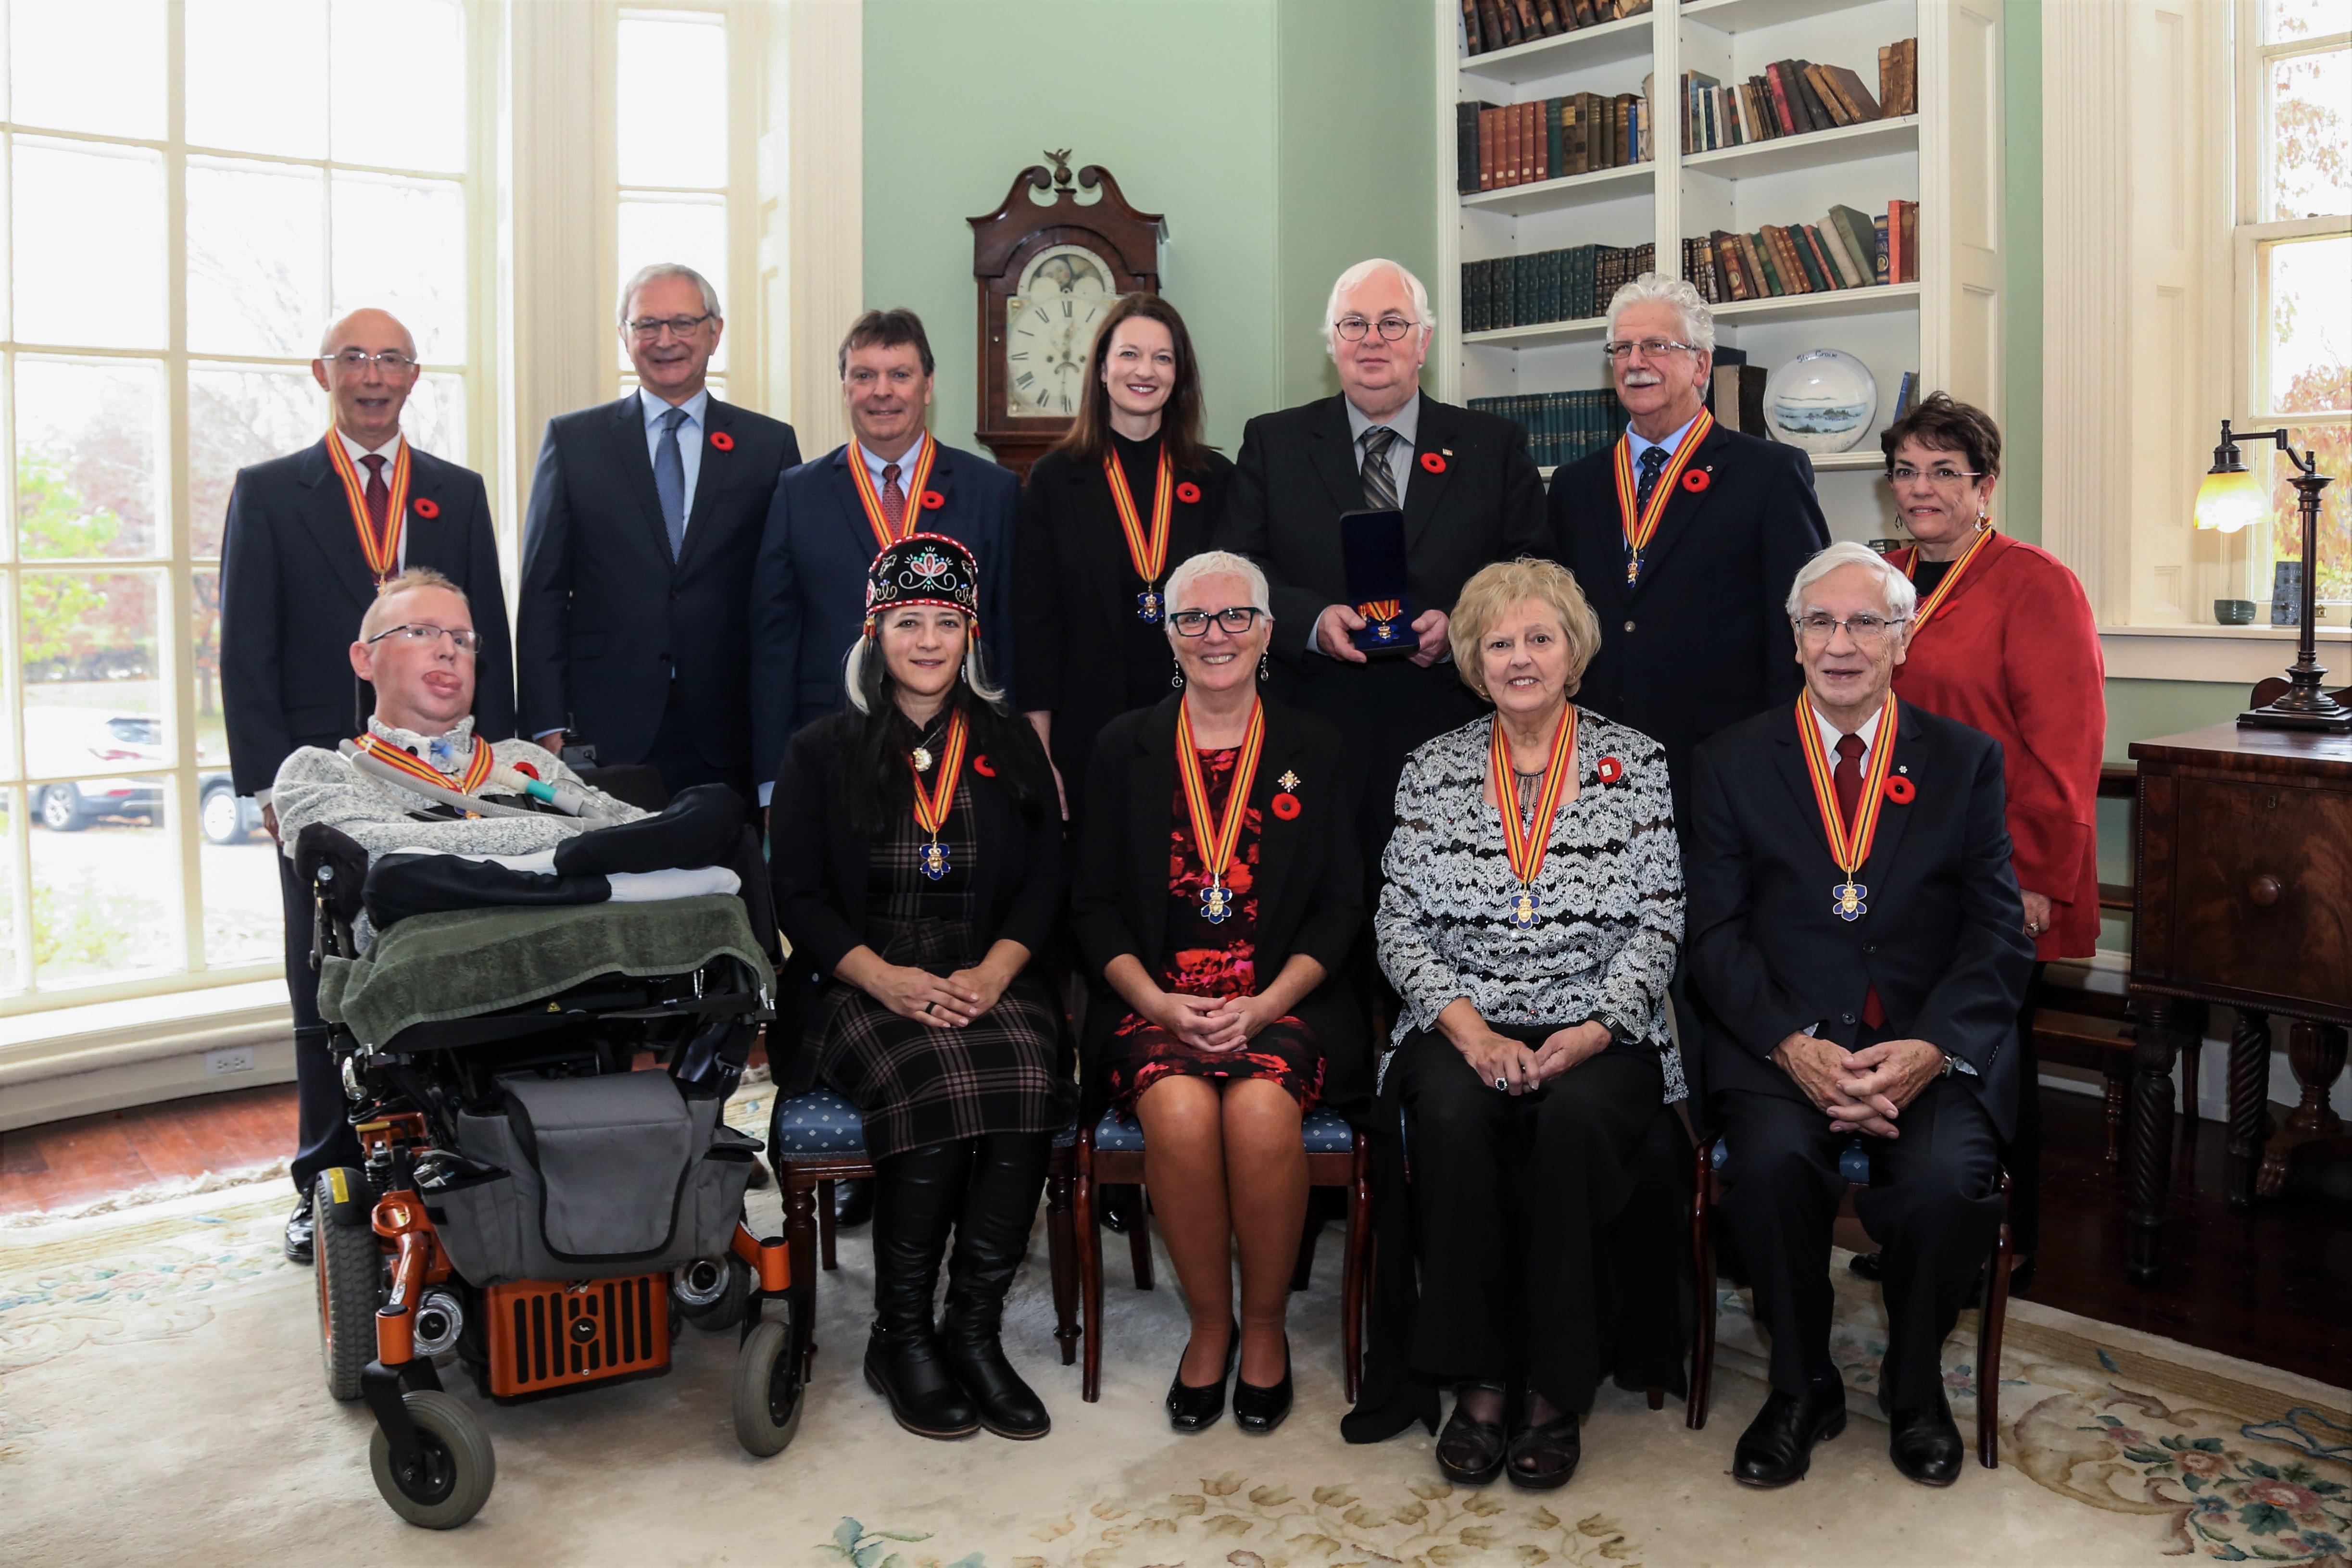 2019 Order of New Brunswick Recipients